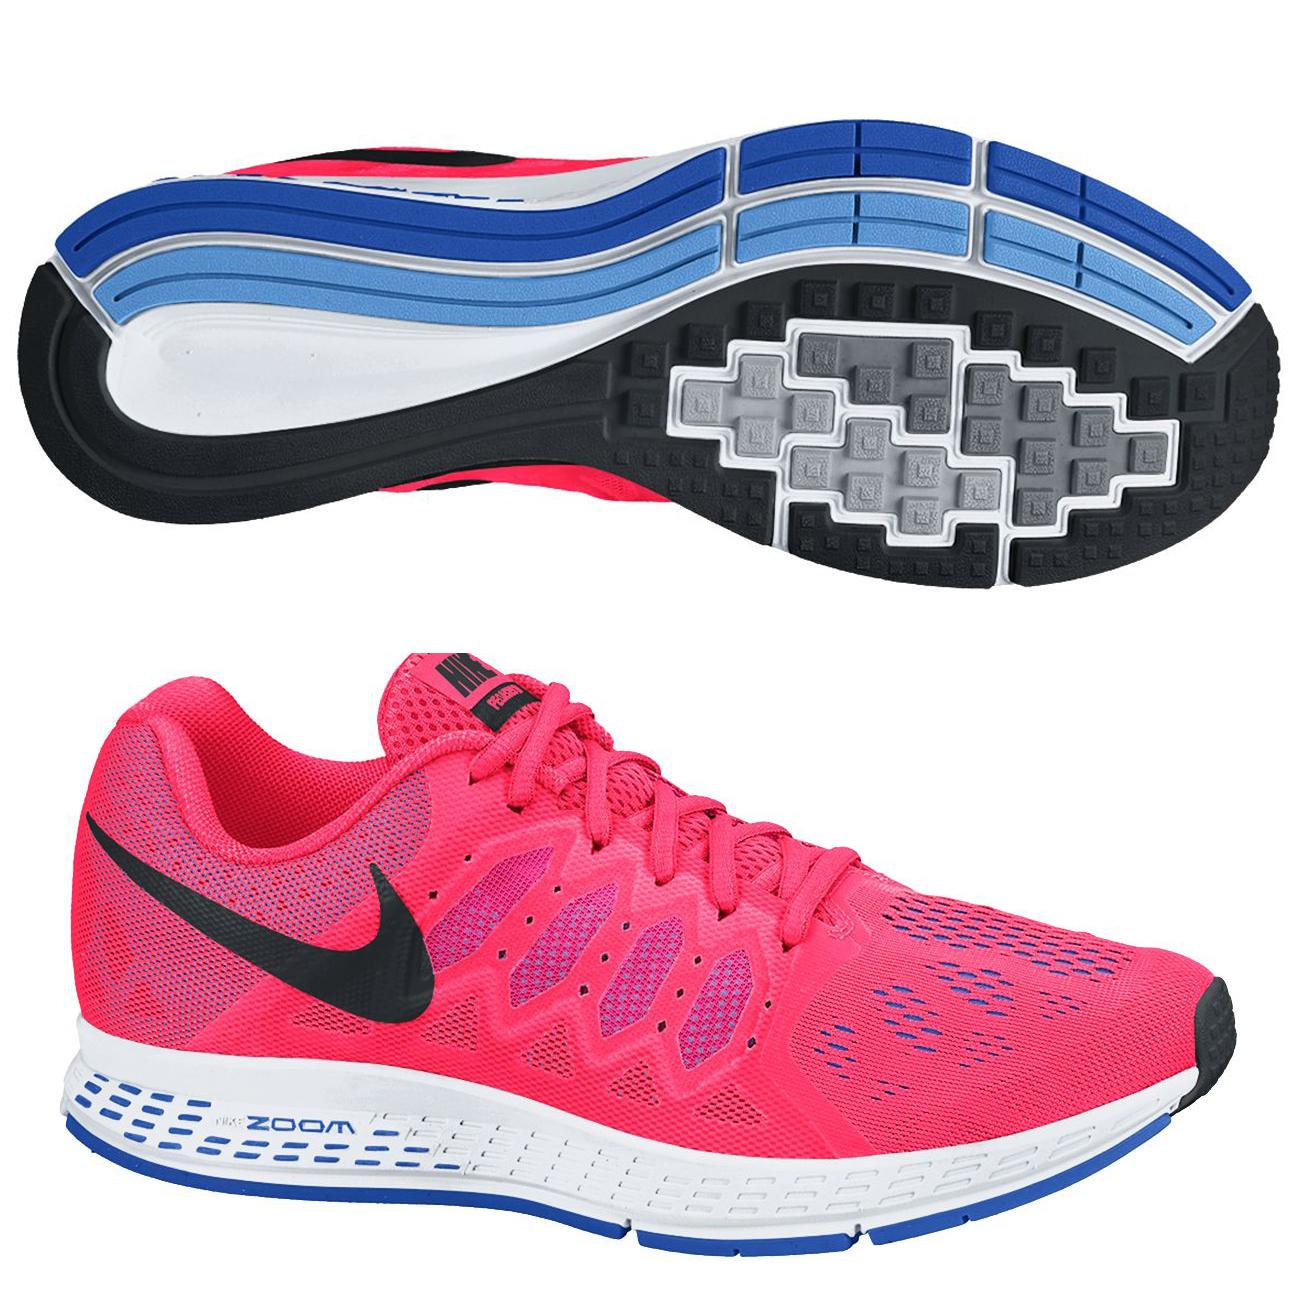 Nike Zoom Pegasus 31 Trainers Pink